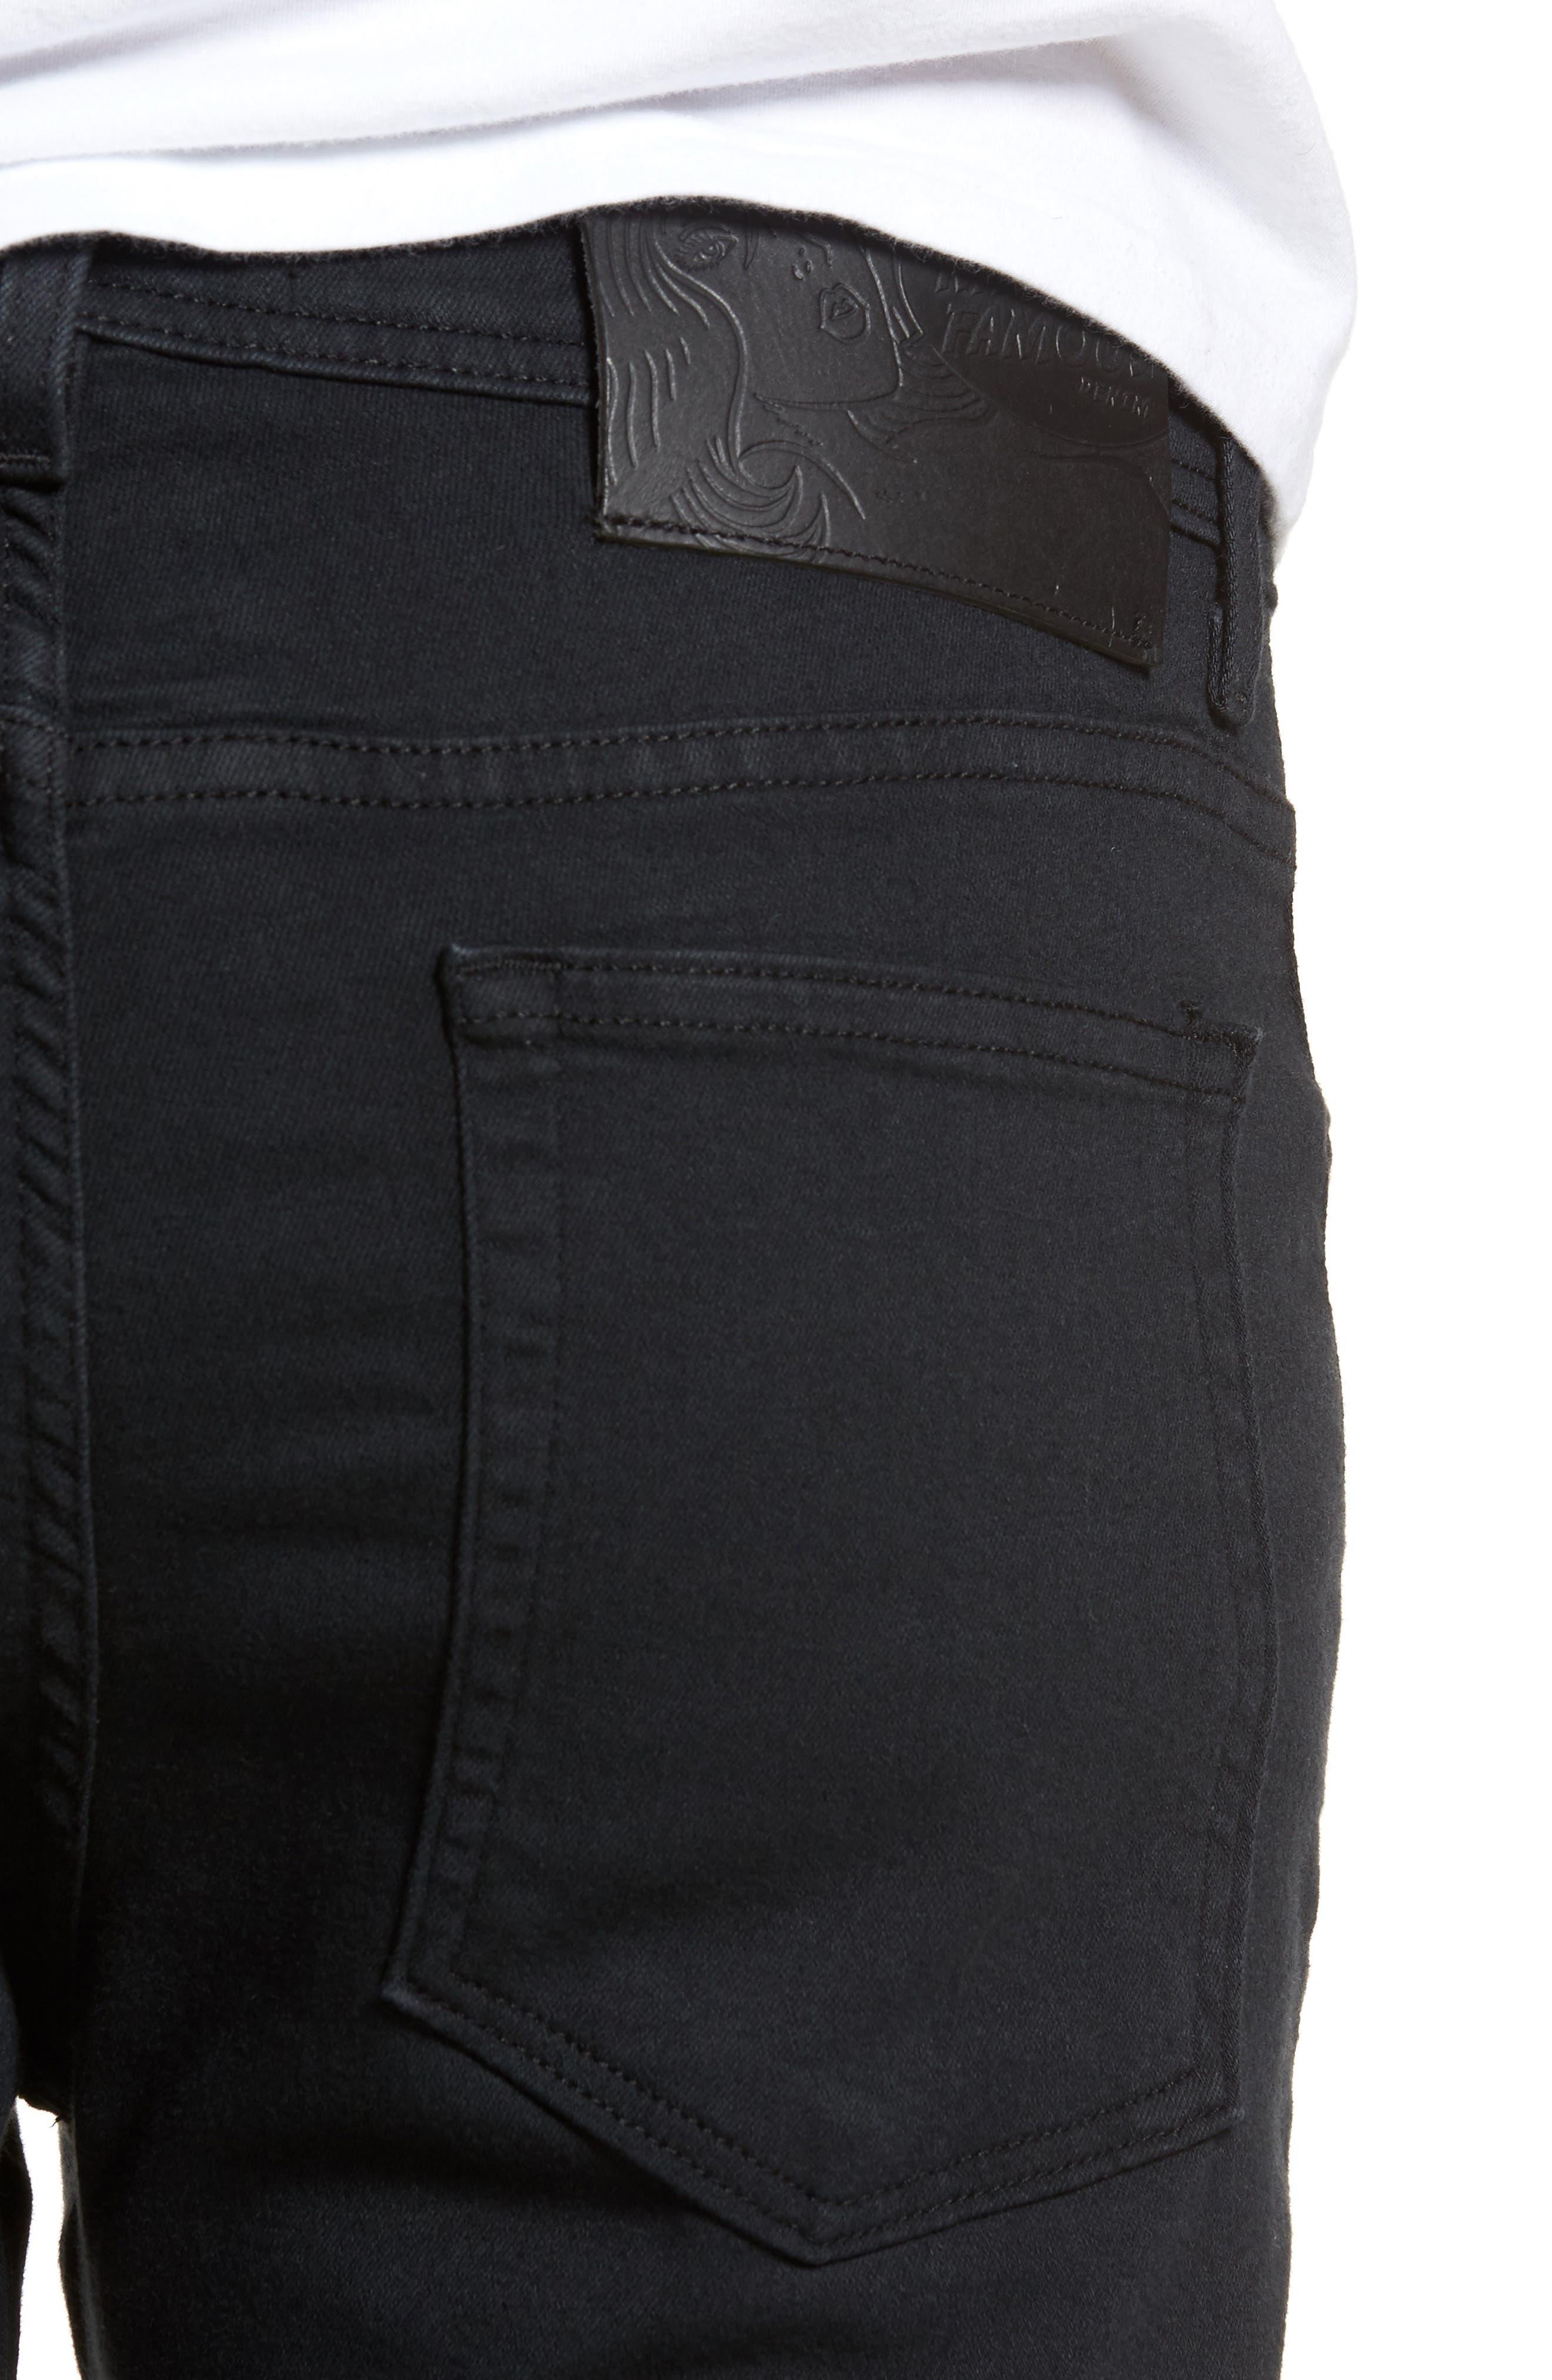 Weird Guy Slim Fit Jeans,                             Alternate thumbnail 4, color,                             Black